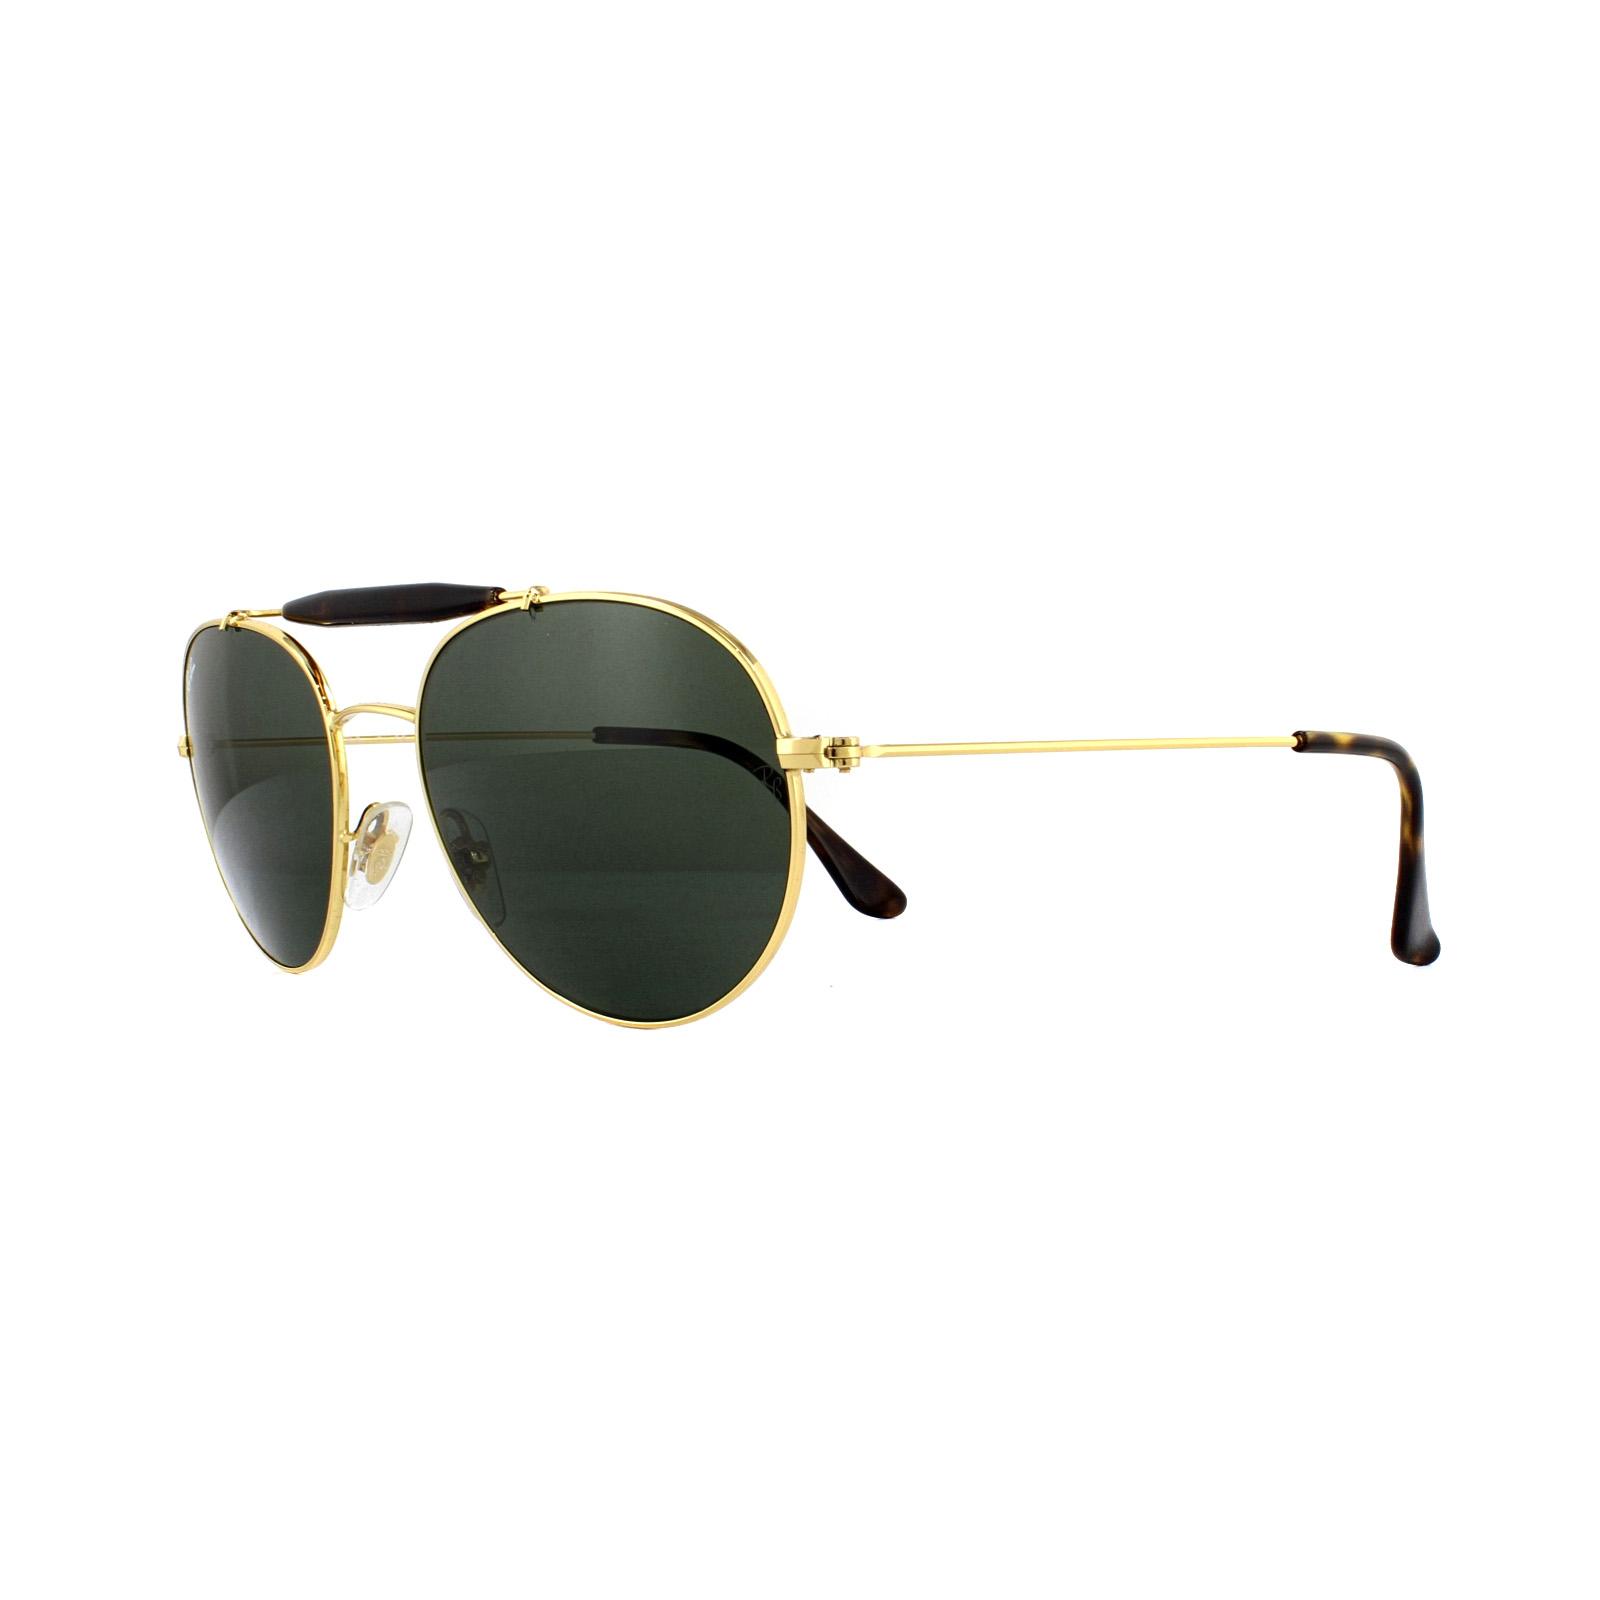 0566152717e5 Ray-Ban Sunglasses RB3540 001 Gold Green 8053672611878 | eBay